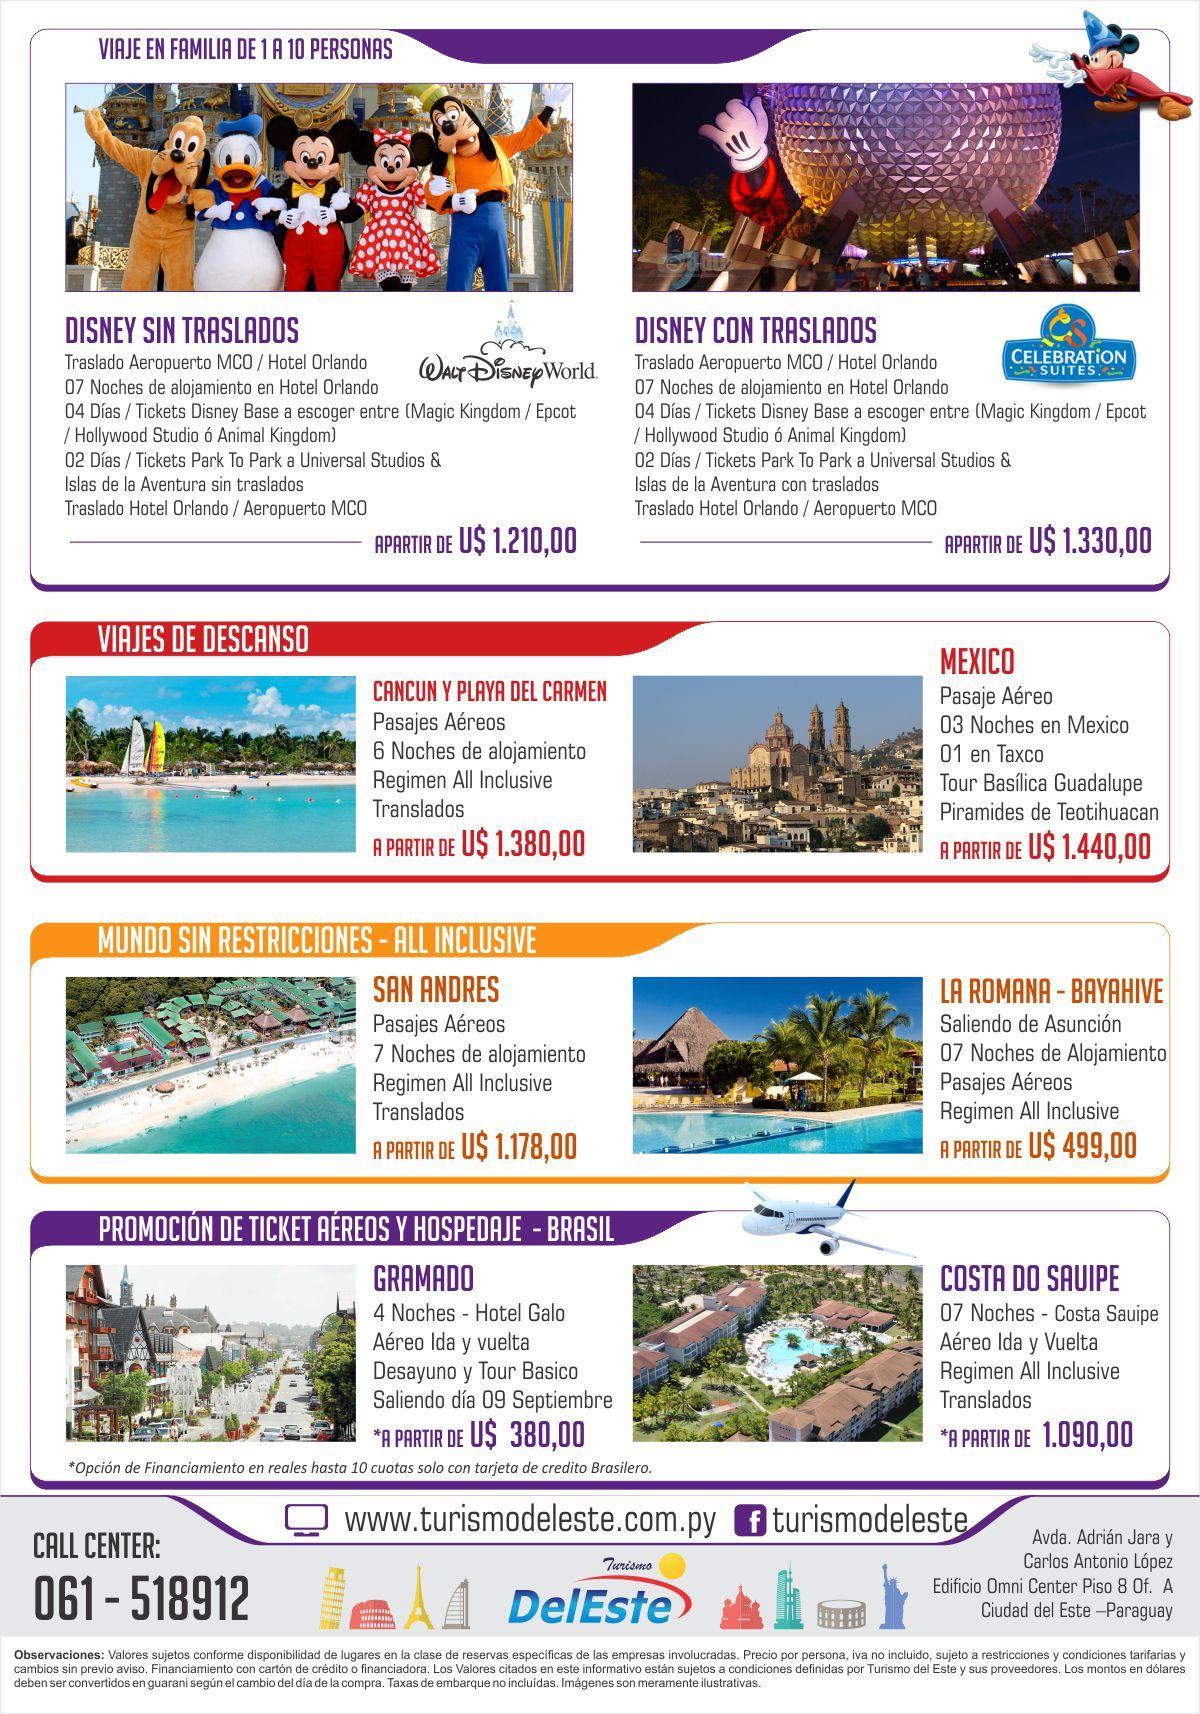 Flyer De Paquetes A Disney Turismo Del Este Pinterest Flyer - Disney flyer template